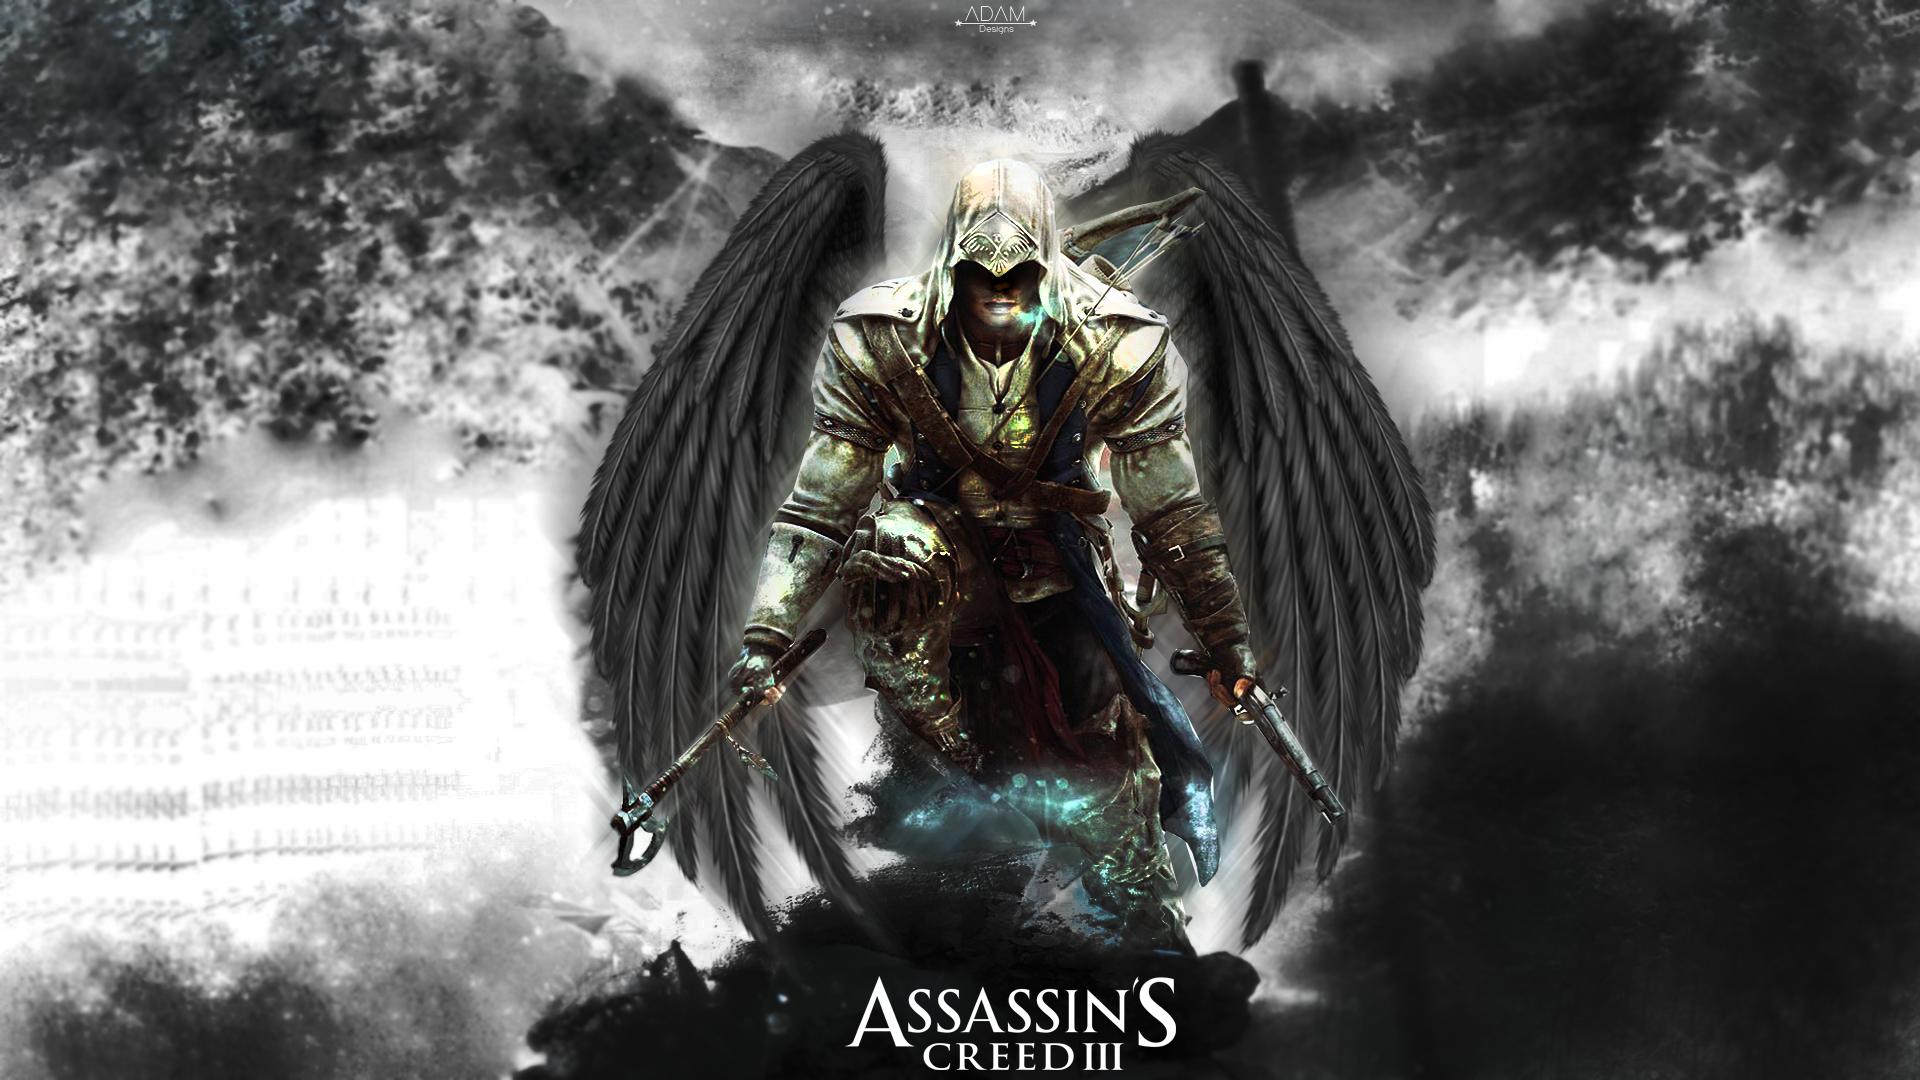 Assassins Creed Wallpaper Posted By Samantha Peltier